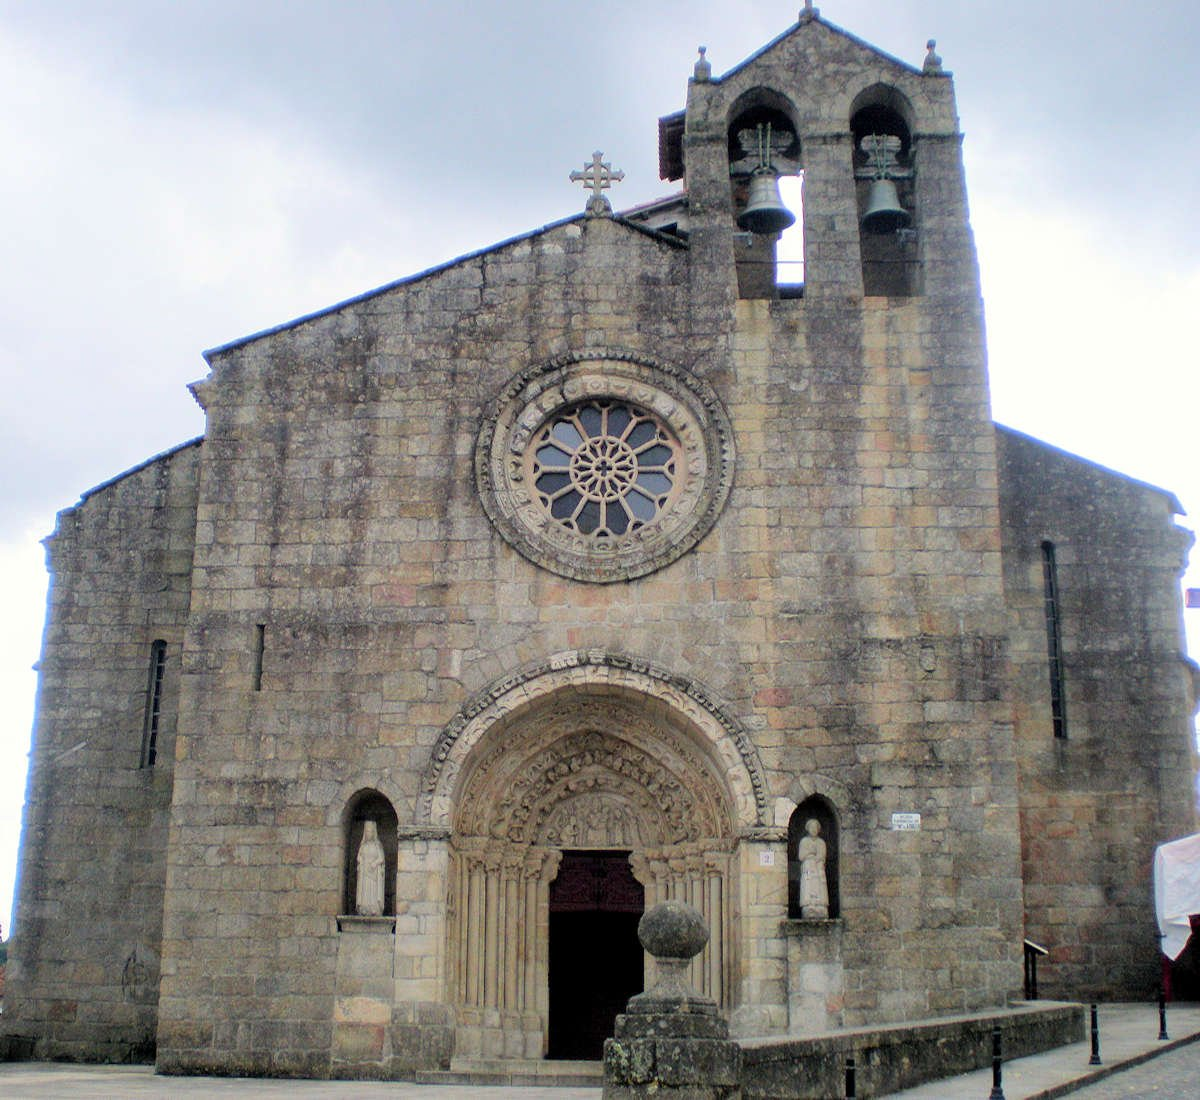 BETANZOS-Monumentos - edificaciones